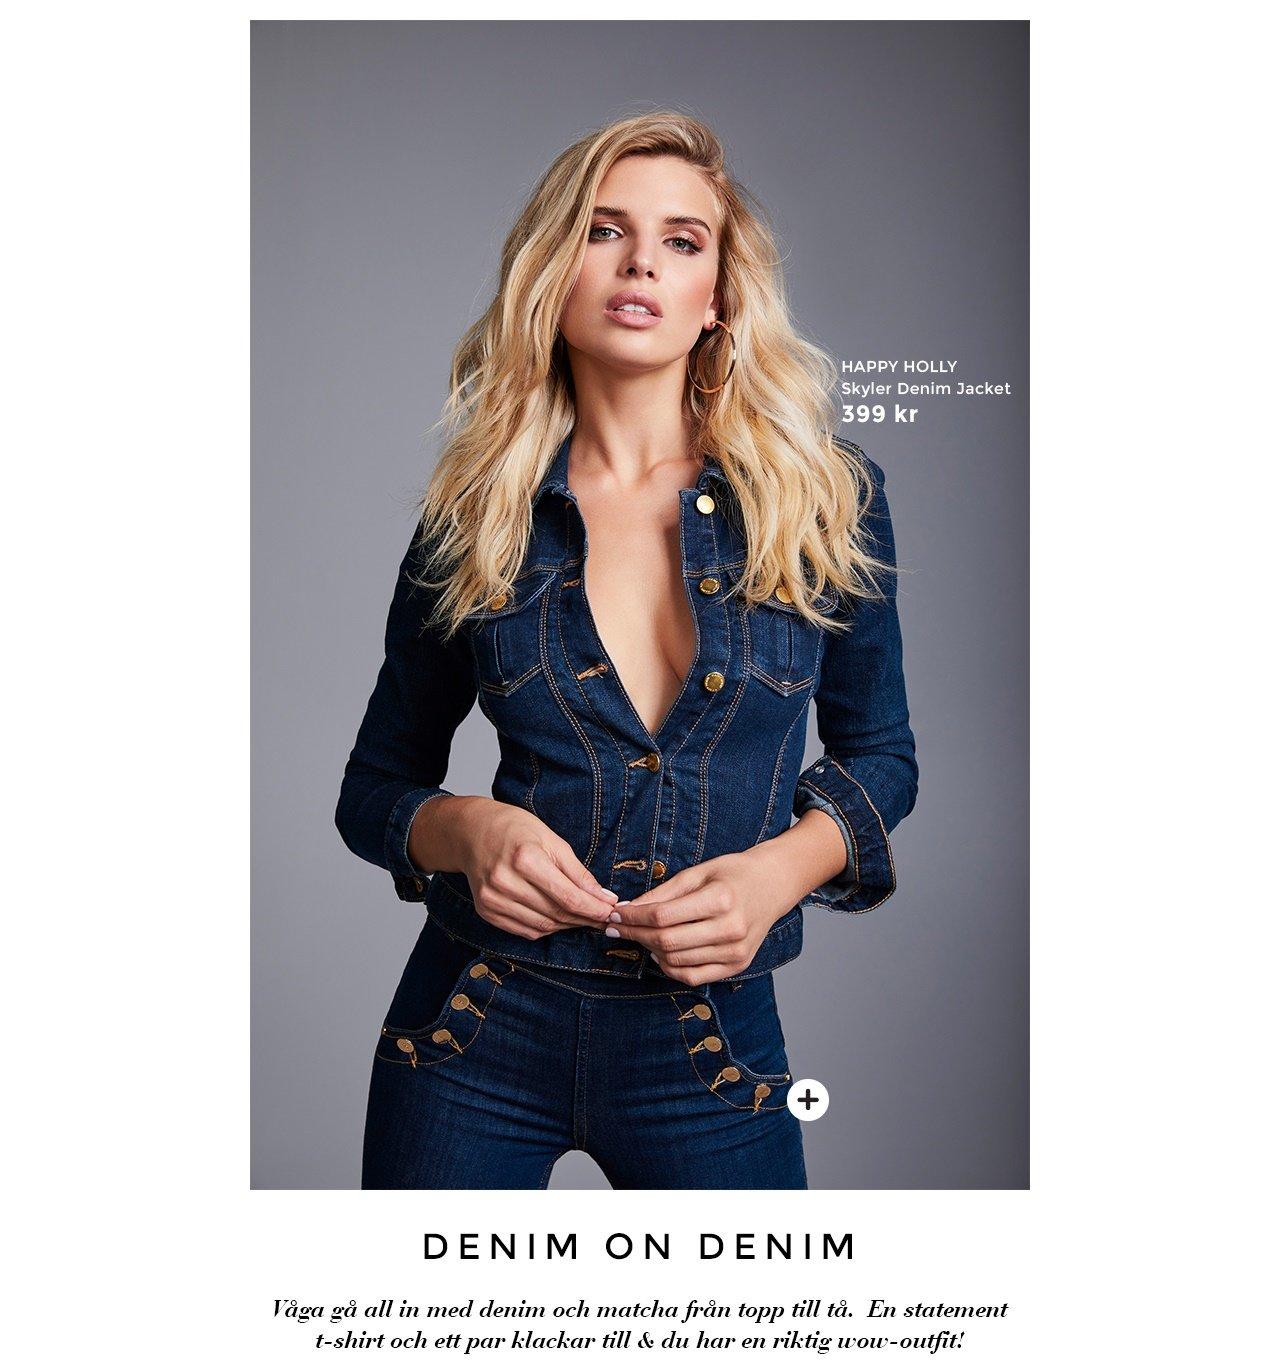 Skyler denim jacket - Adina highwaist jeans